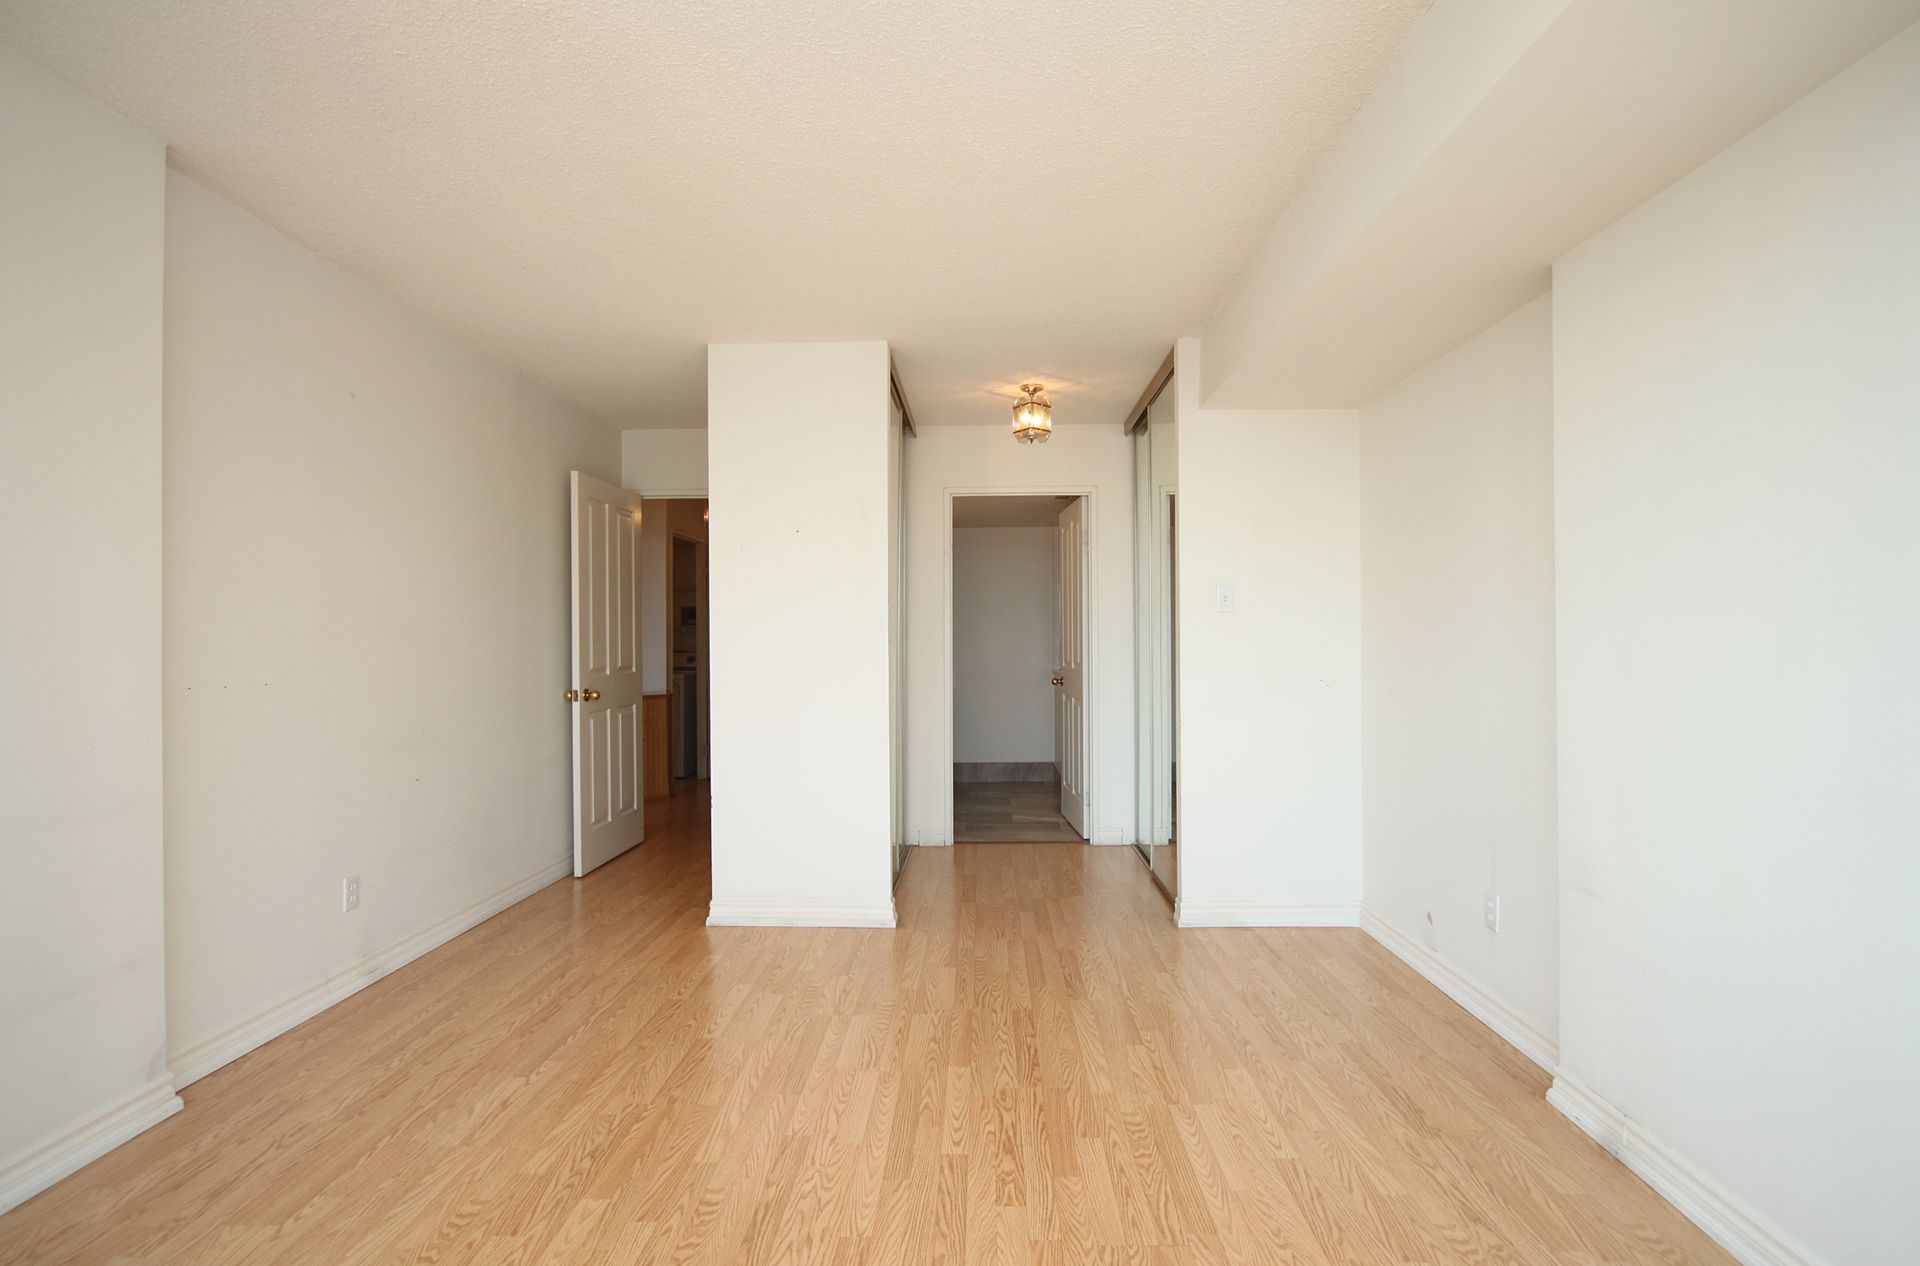 Primary Bedroom at PH211 - 1121 Steeles Avenue W, Westminster-Branson, Toronto